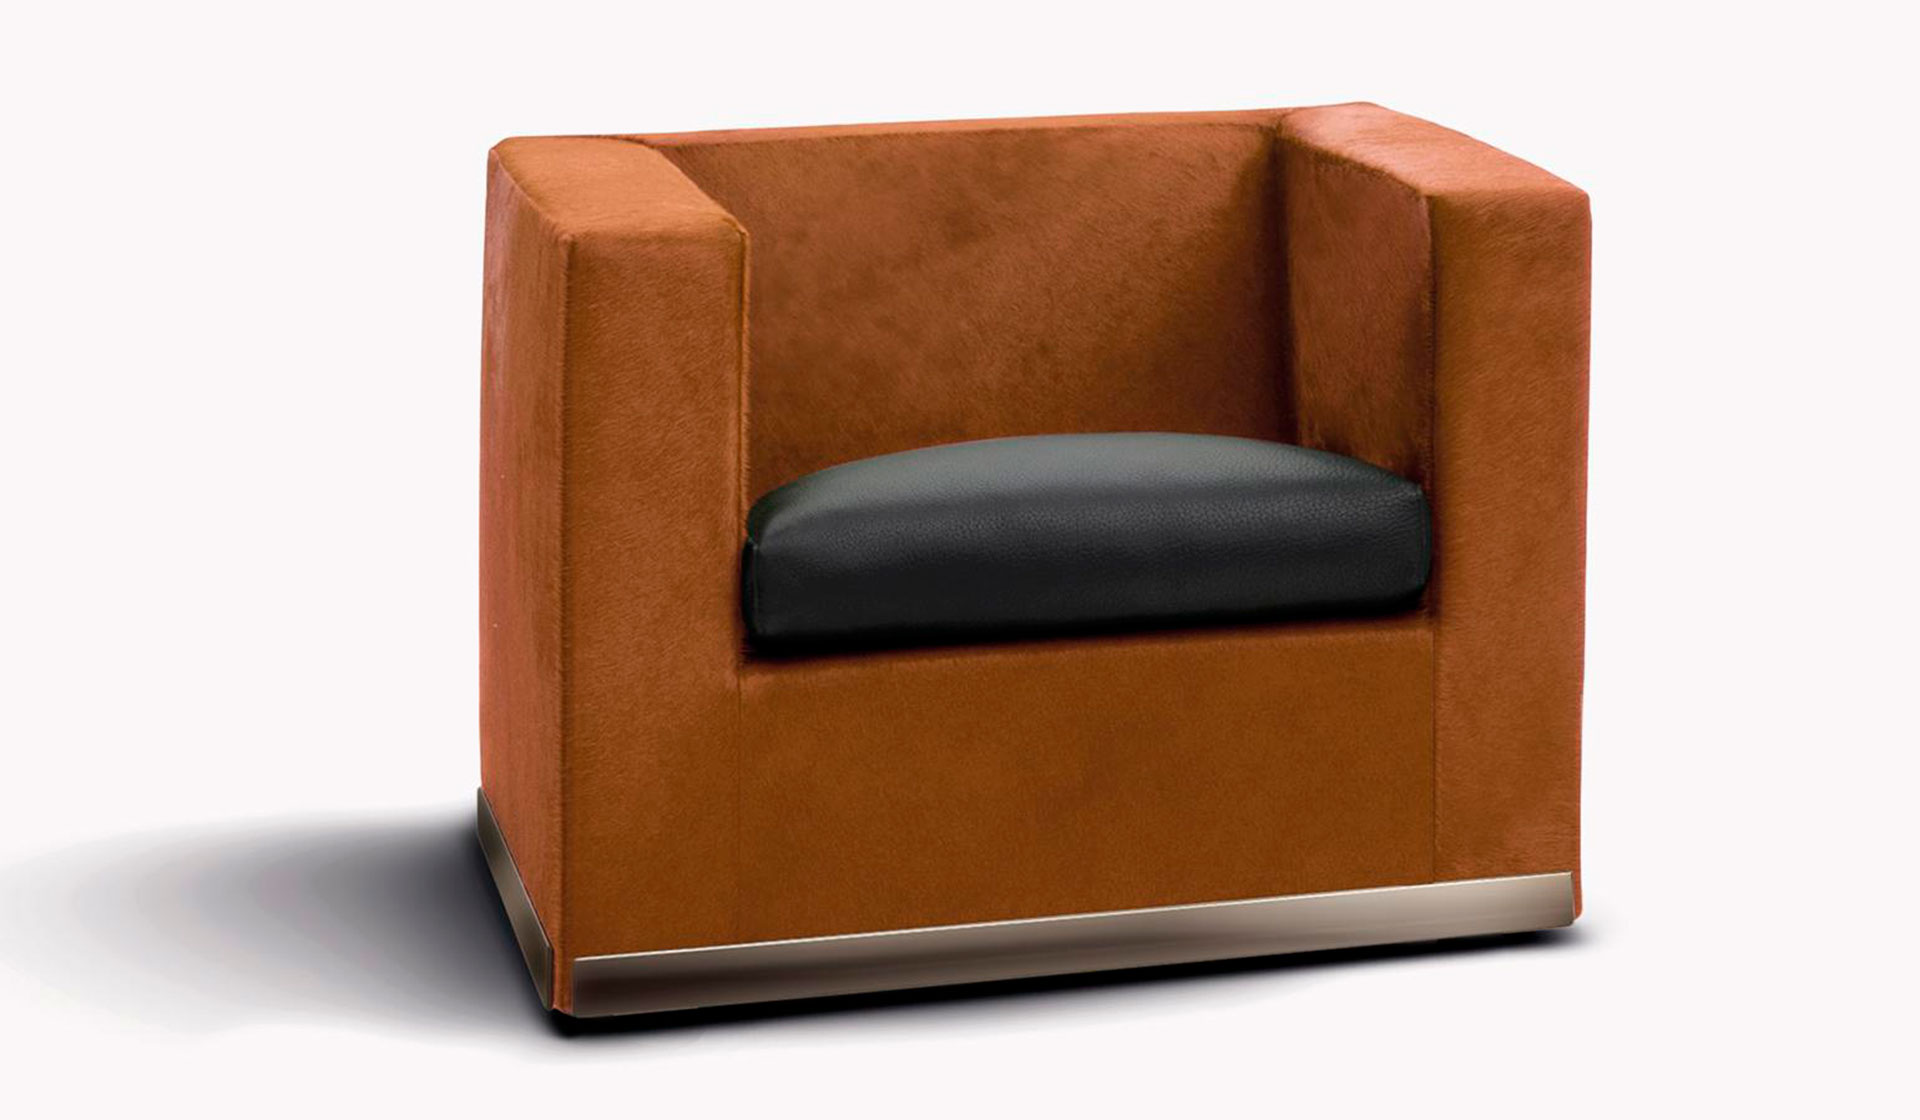 Minotti Suitcase Armchair designed by Rodolfo Dordoni